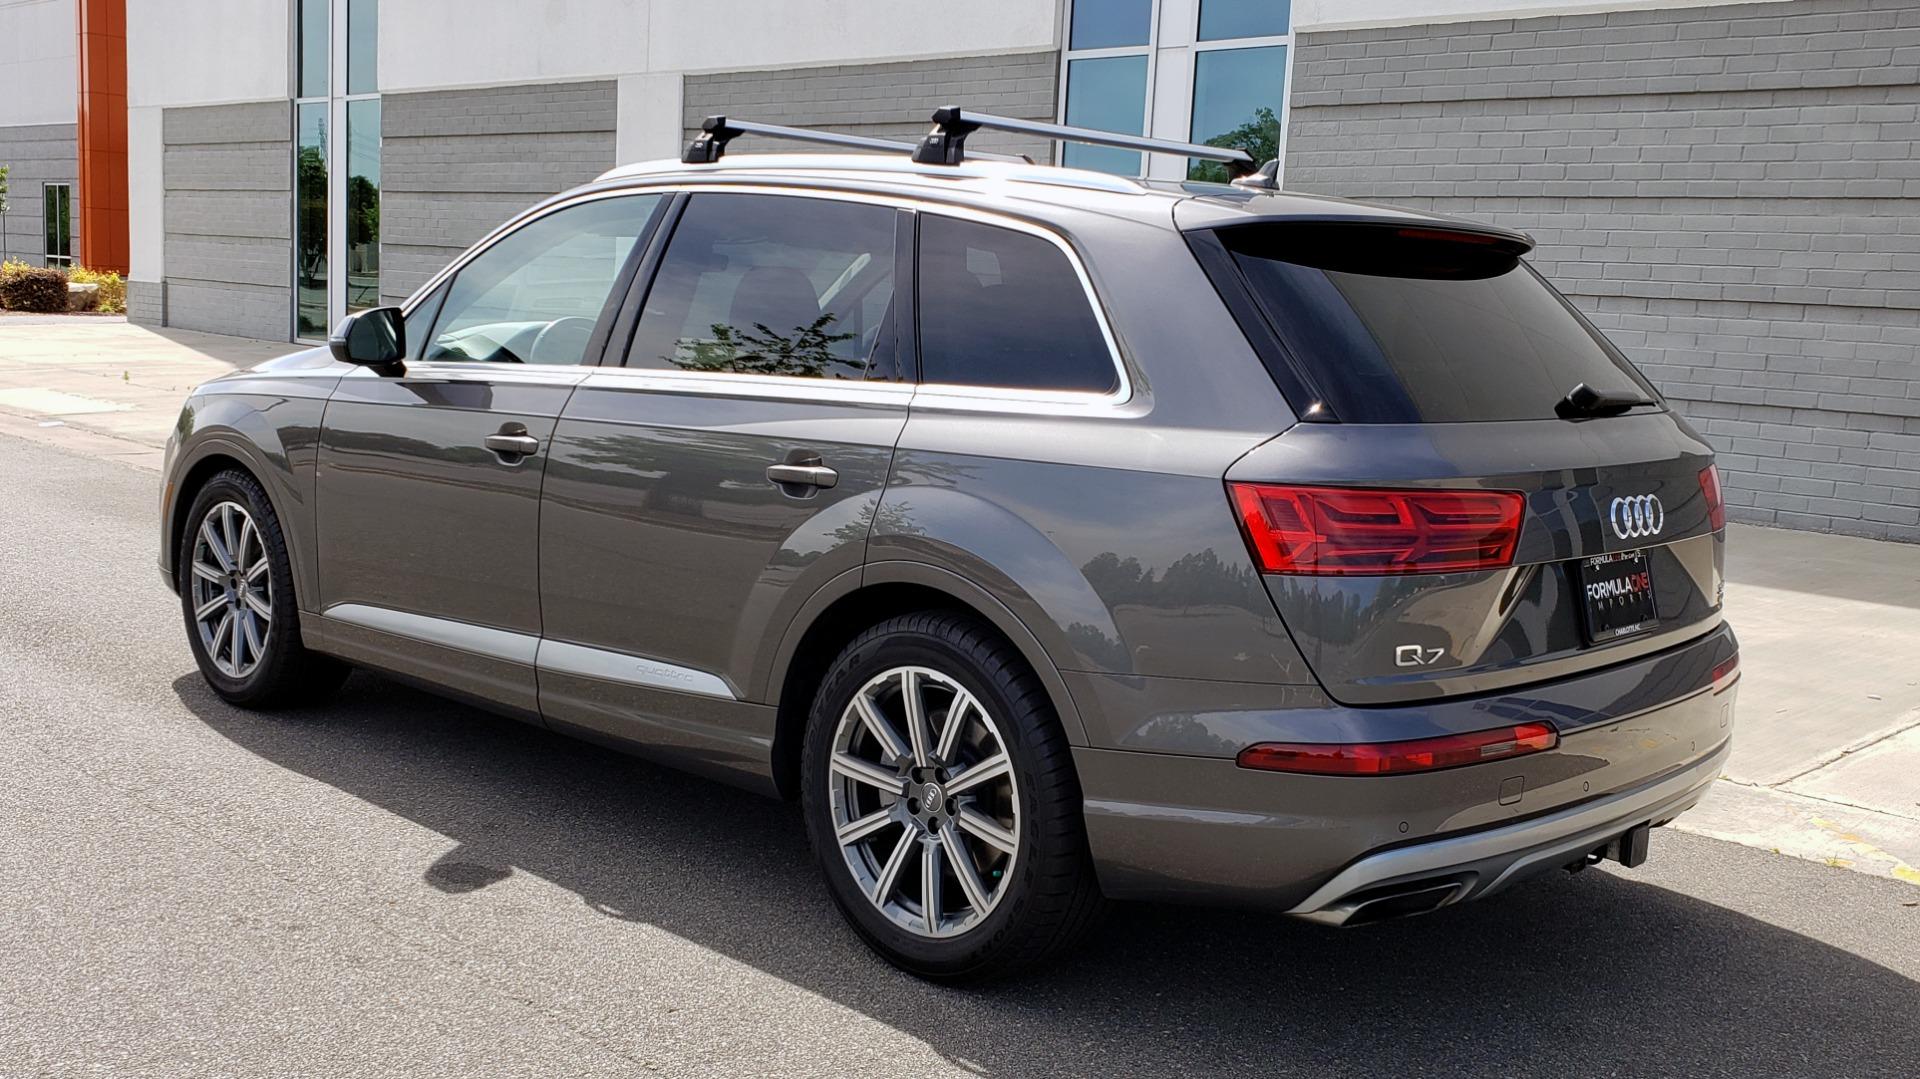 Used 2018 Audi Q7 PRESTIGE TIPTRONIC / NAV / SUNROOF / ADAPTIVE PKG / DRVR ASST / CLD WTHR /  for sale $49,995 at Formula Imports in Charlotte NC 28227 5